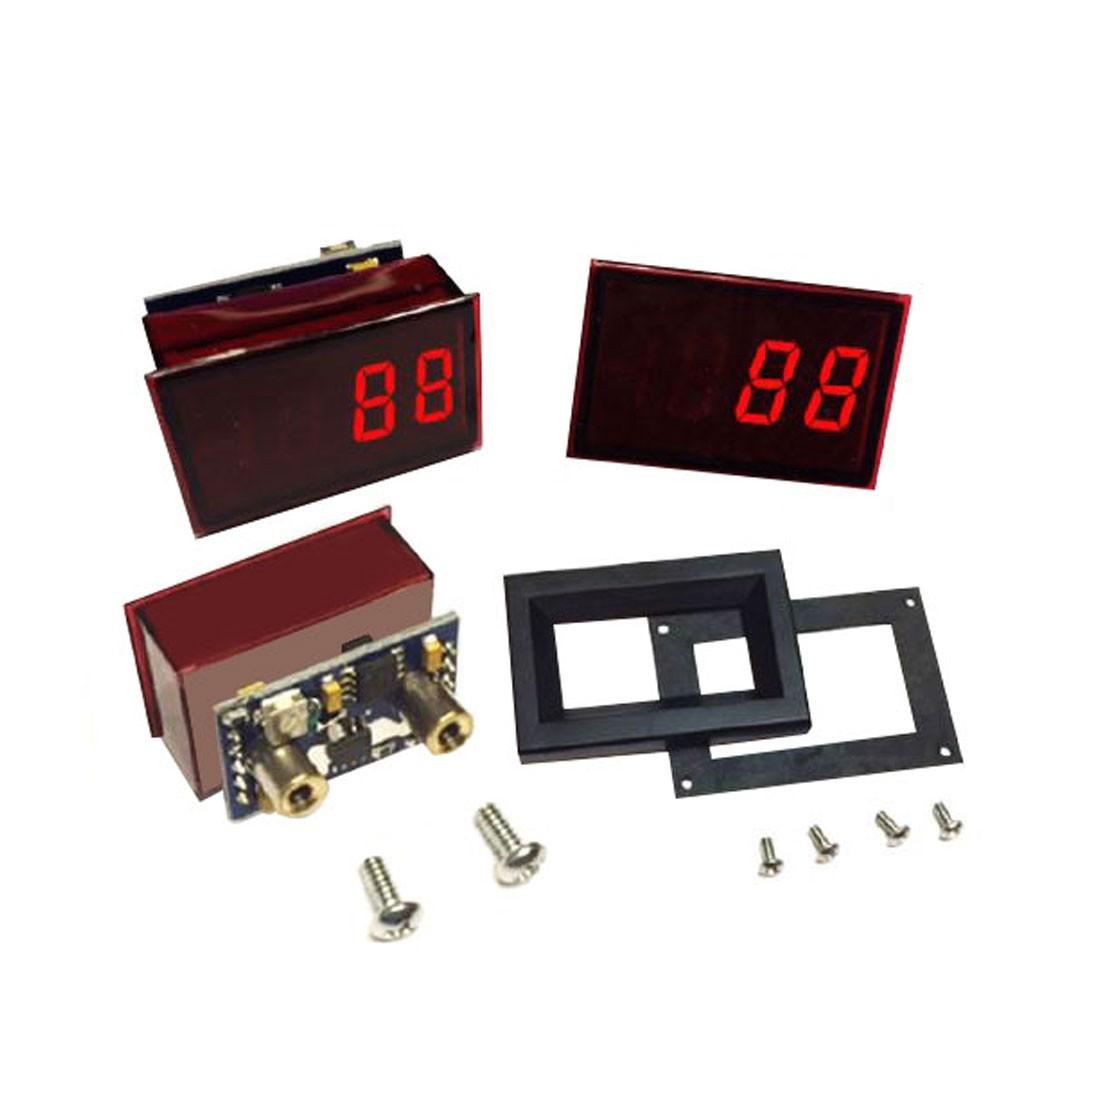 DLA20-LM Series LED Digital Panel Meter